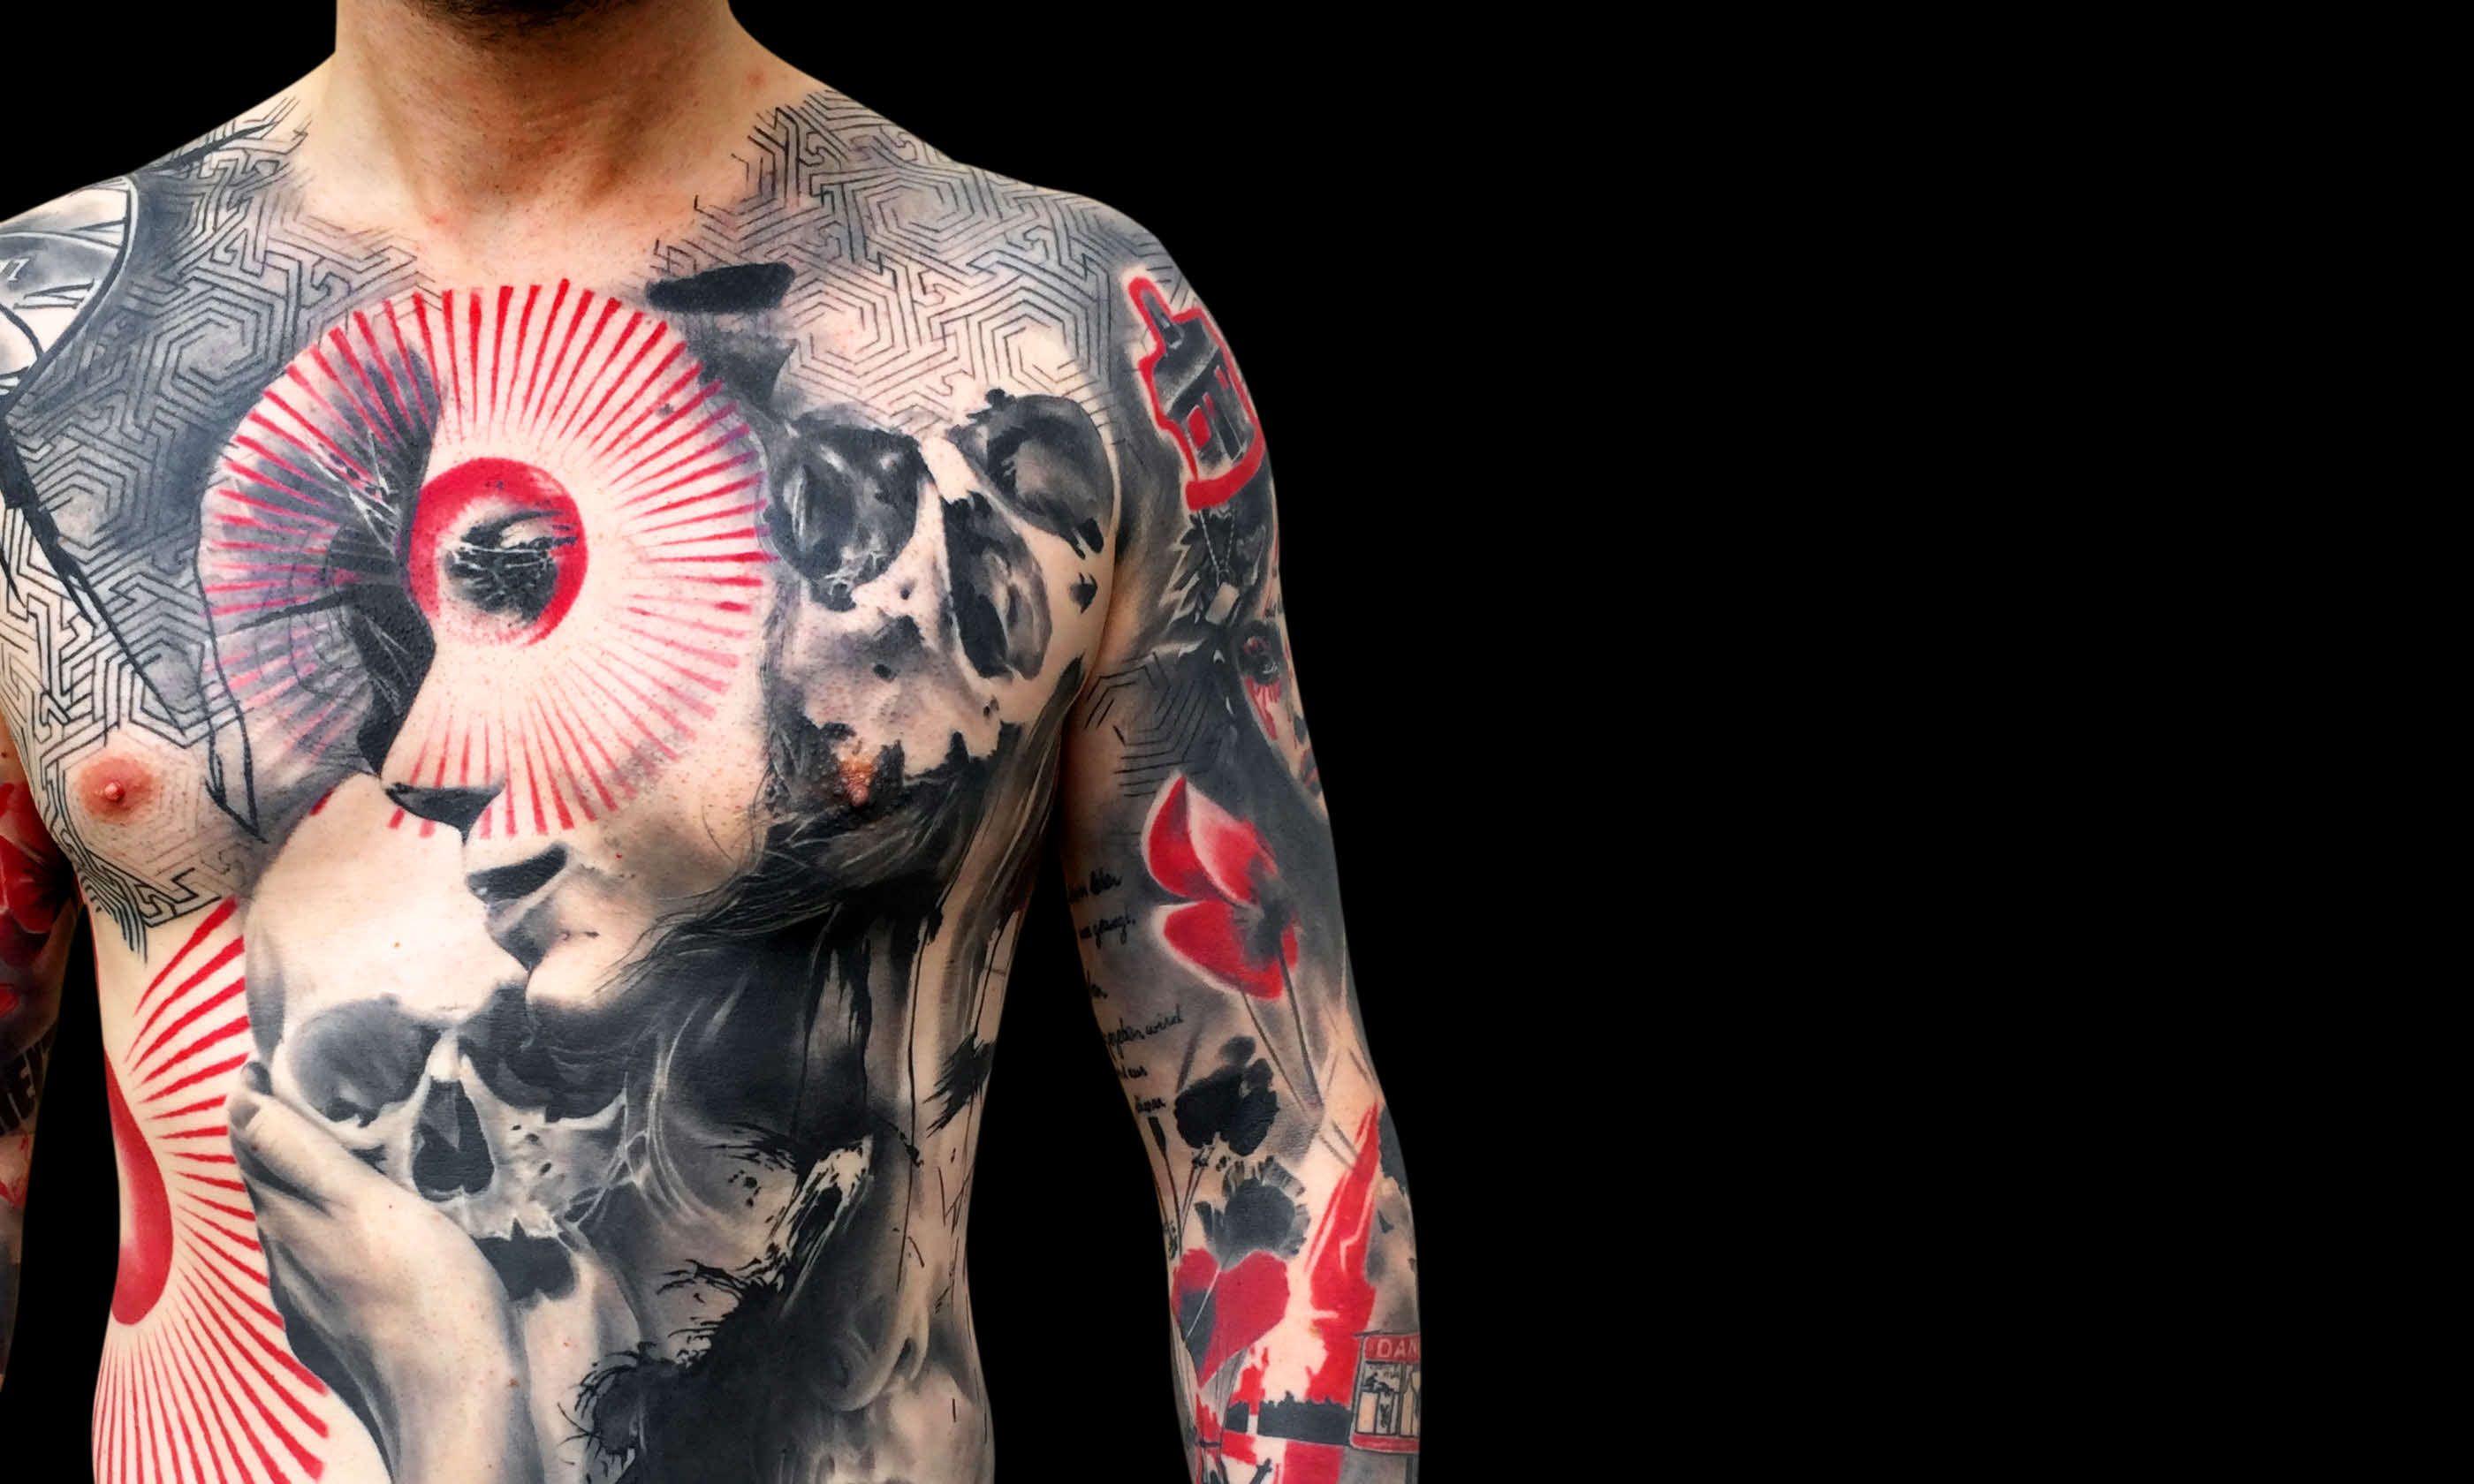 Health & Beauty Initiative Tattoo Low Price